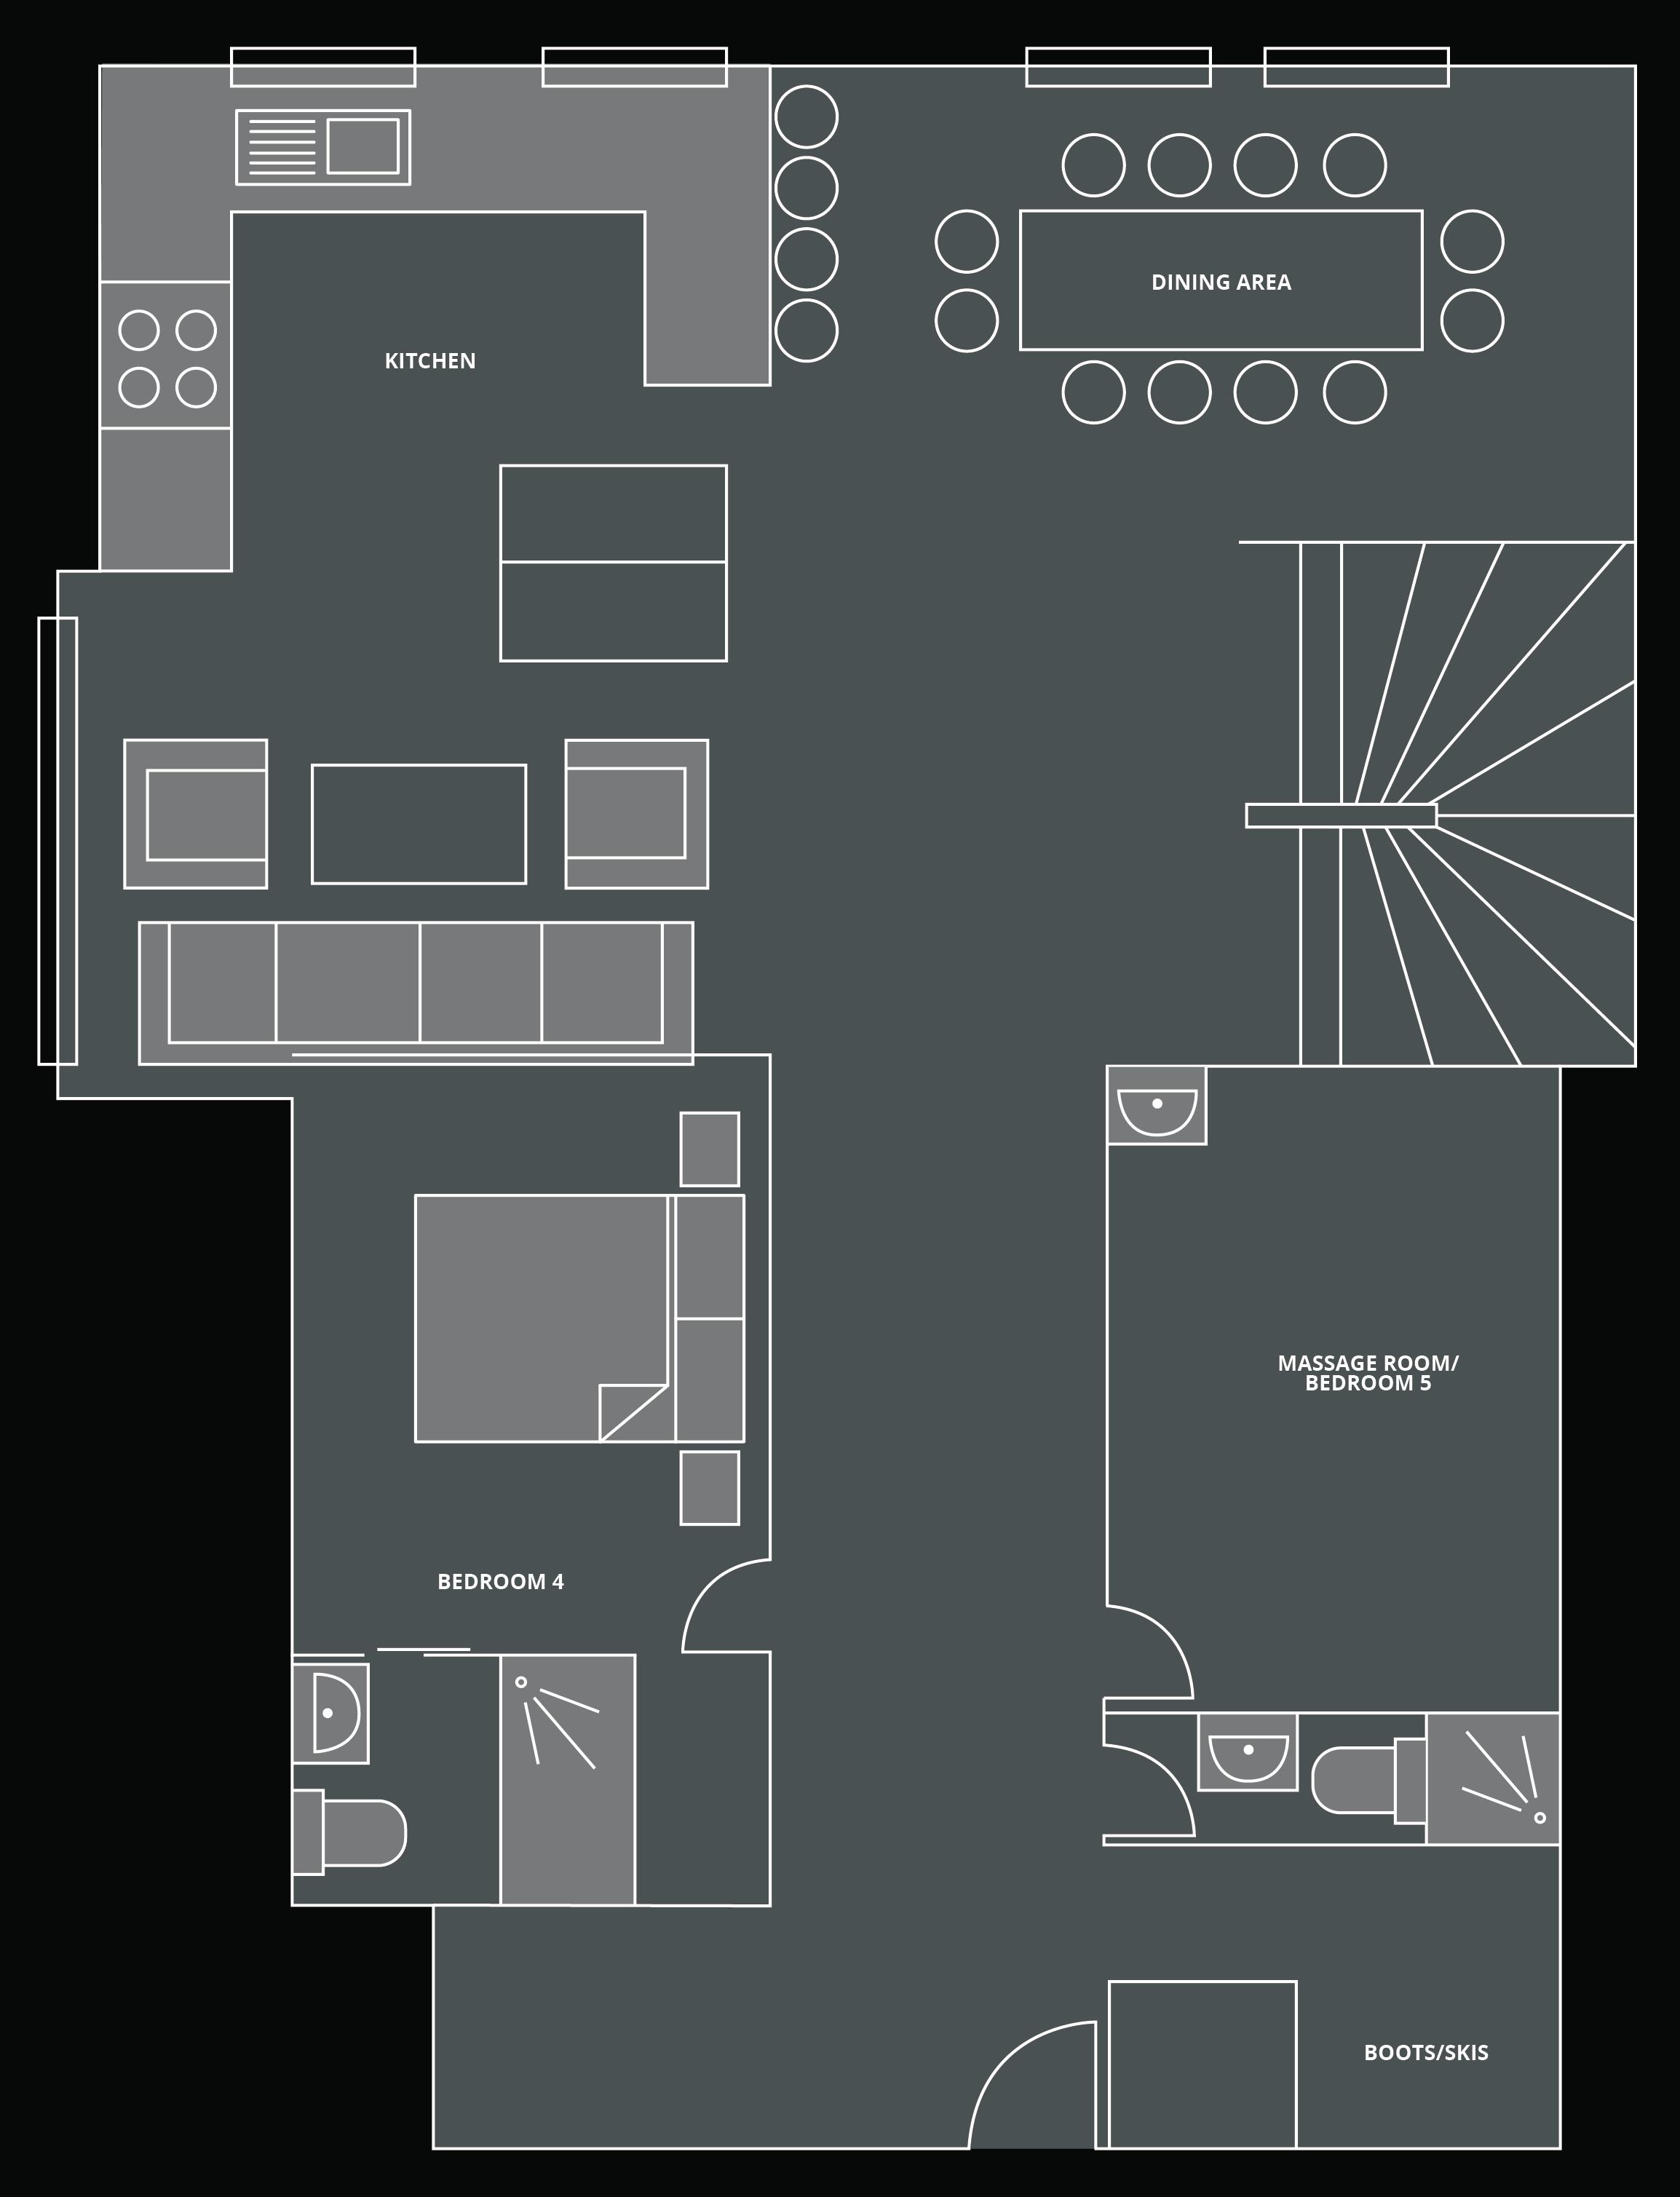 The Old Macaroni Floor Plan